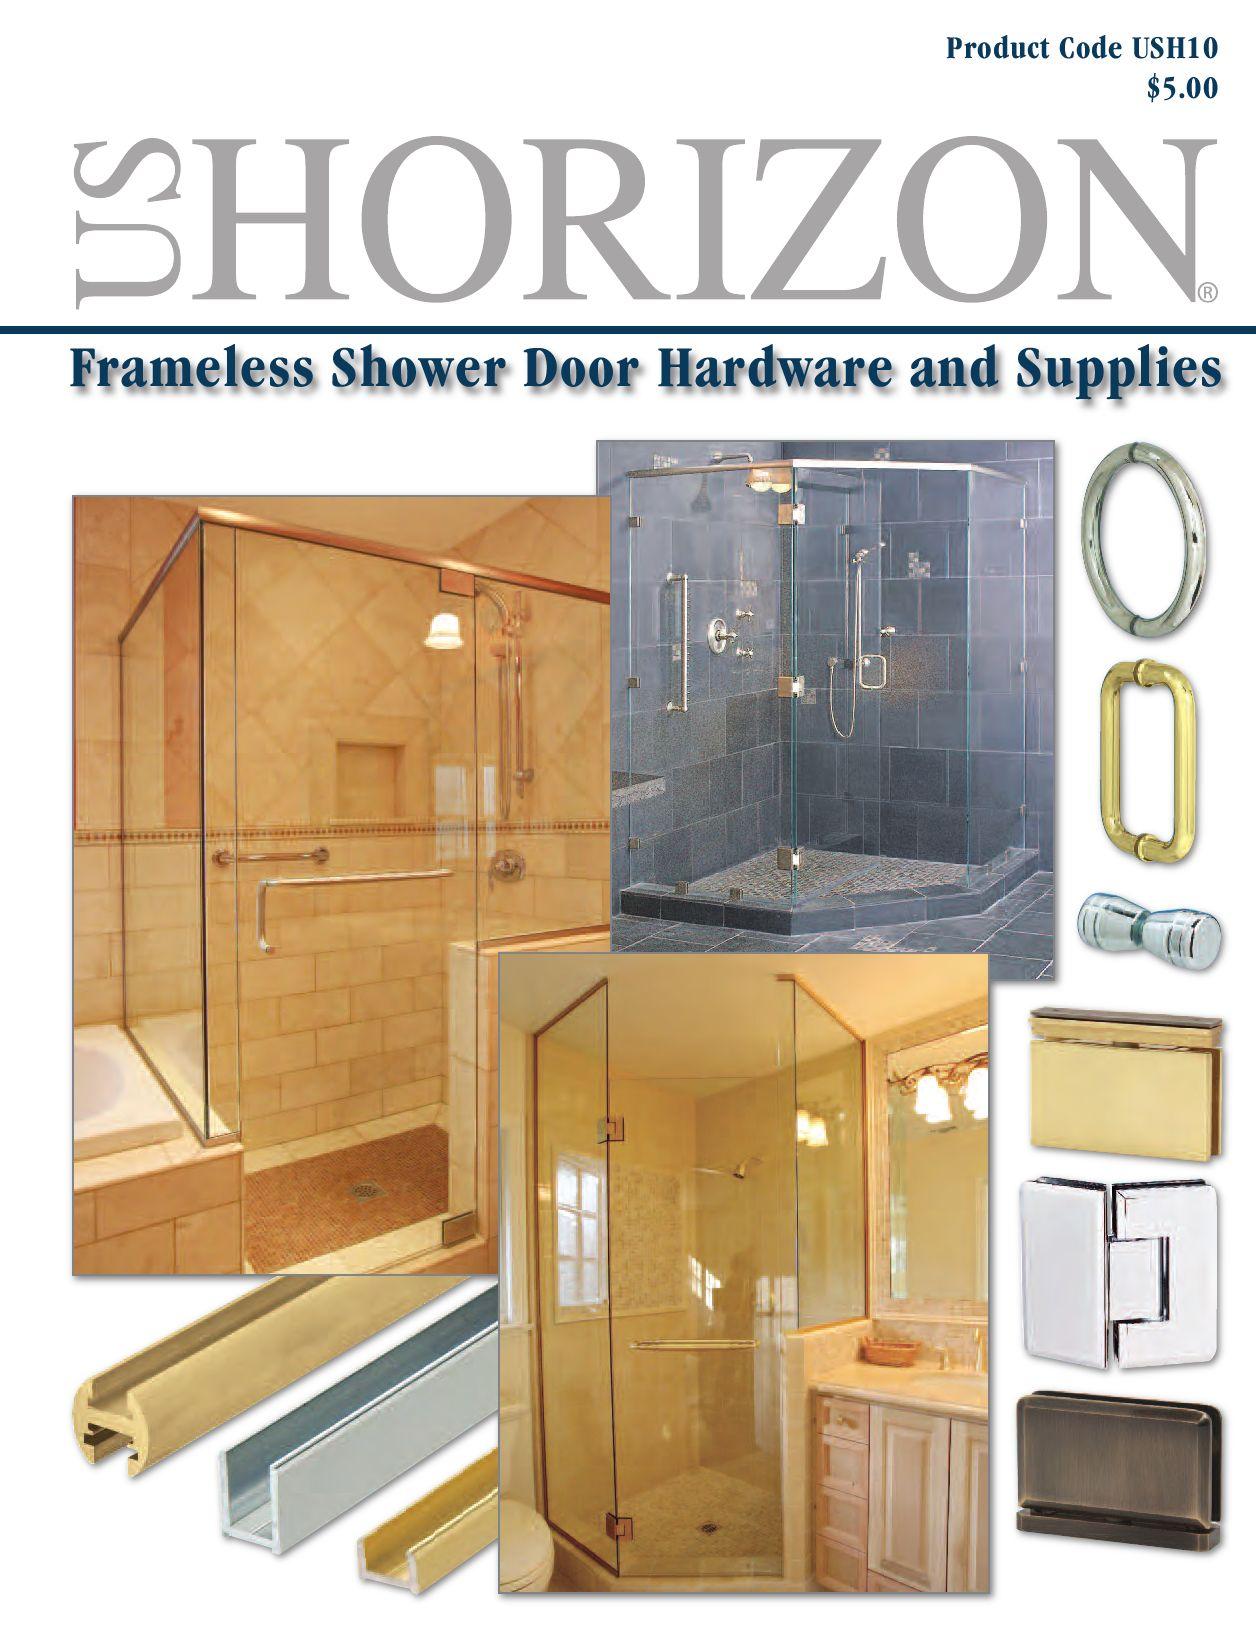 Locks Mini Hinge for 1//4 Glass Shower Doors in Polished Chrome Finish Durable Commercial /& Residential Door Hardware Door Handles